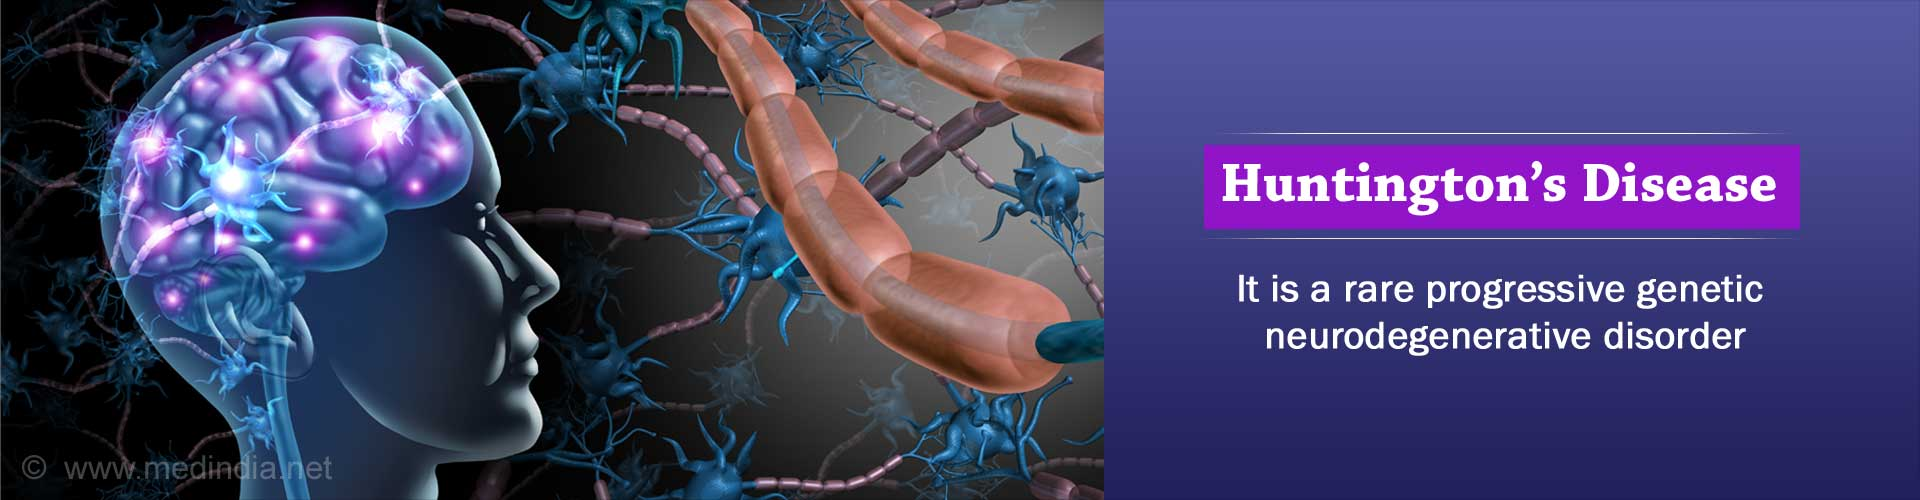 Huntington's Disease | Huntington's Chorea - Causes, Symptoms, Diagnosis, Treatment